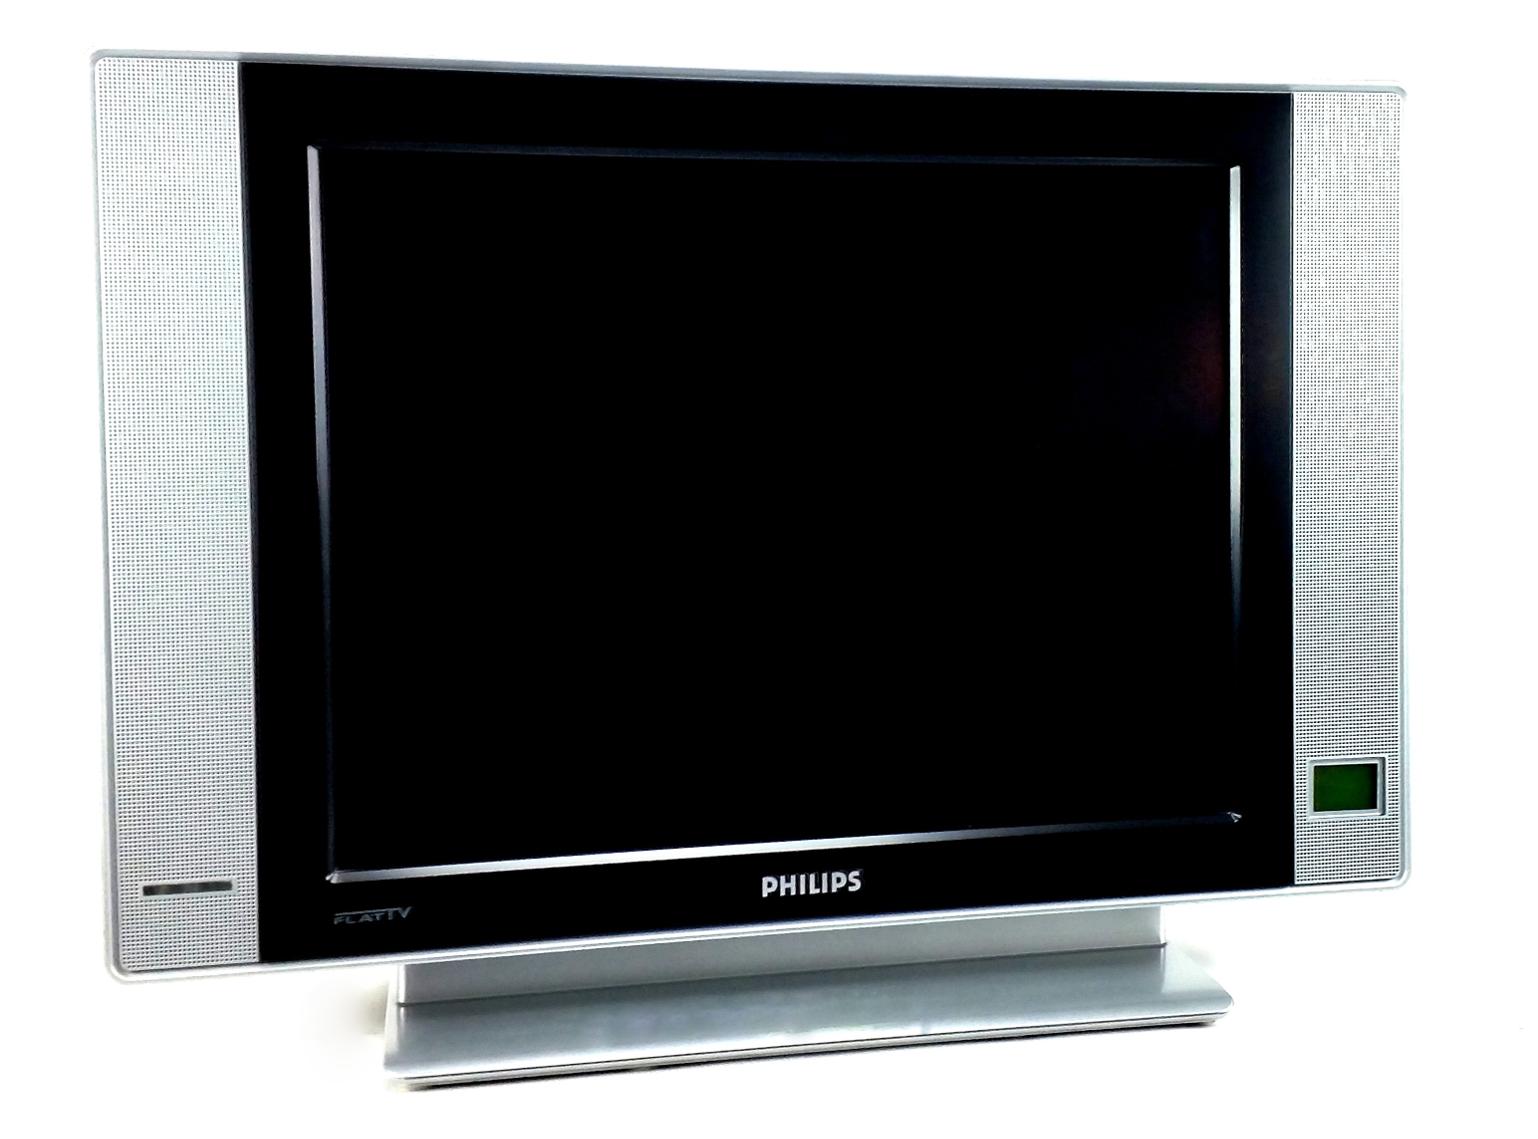 philips 20 51cm flat tv lcd fernseher chinch scart dvi s. Black Bedroom Furniture Sets. Home Design Ideas